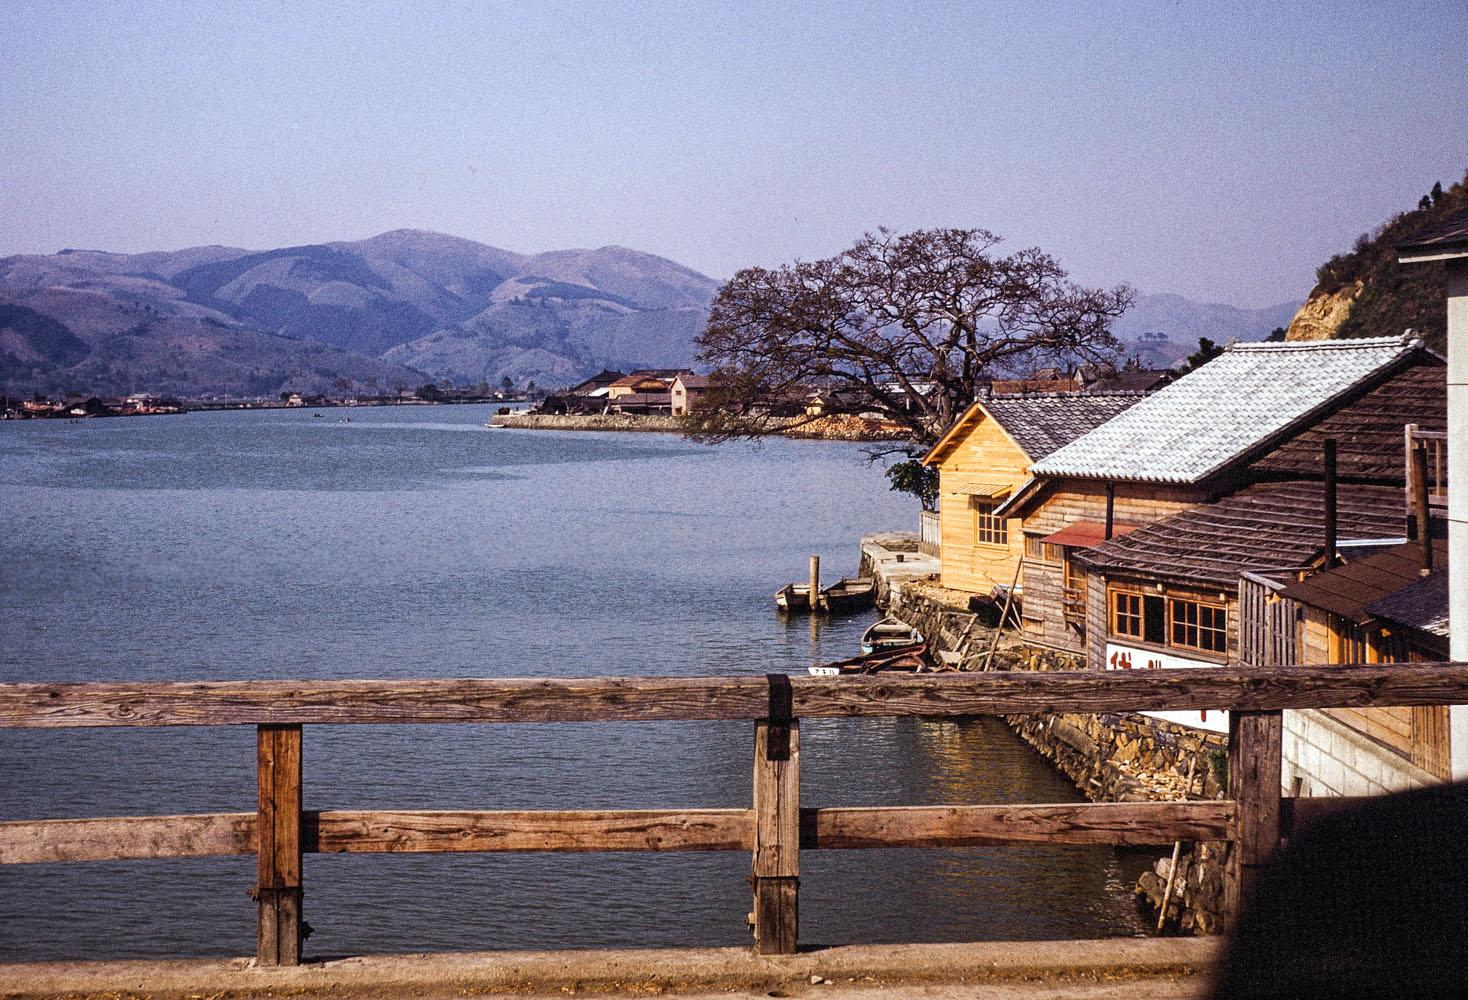 413-Kyukitami River Bridge-Looking North